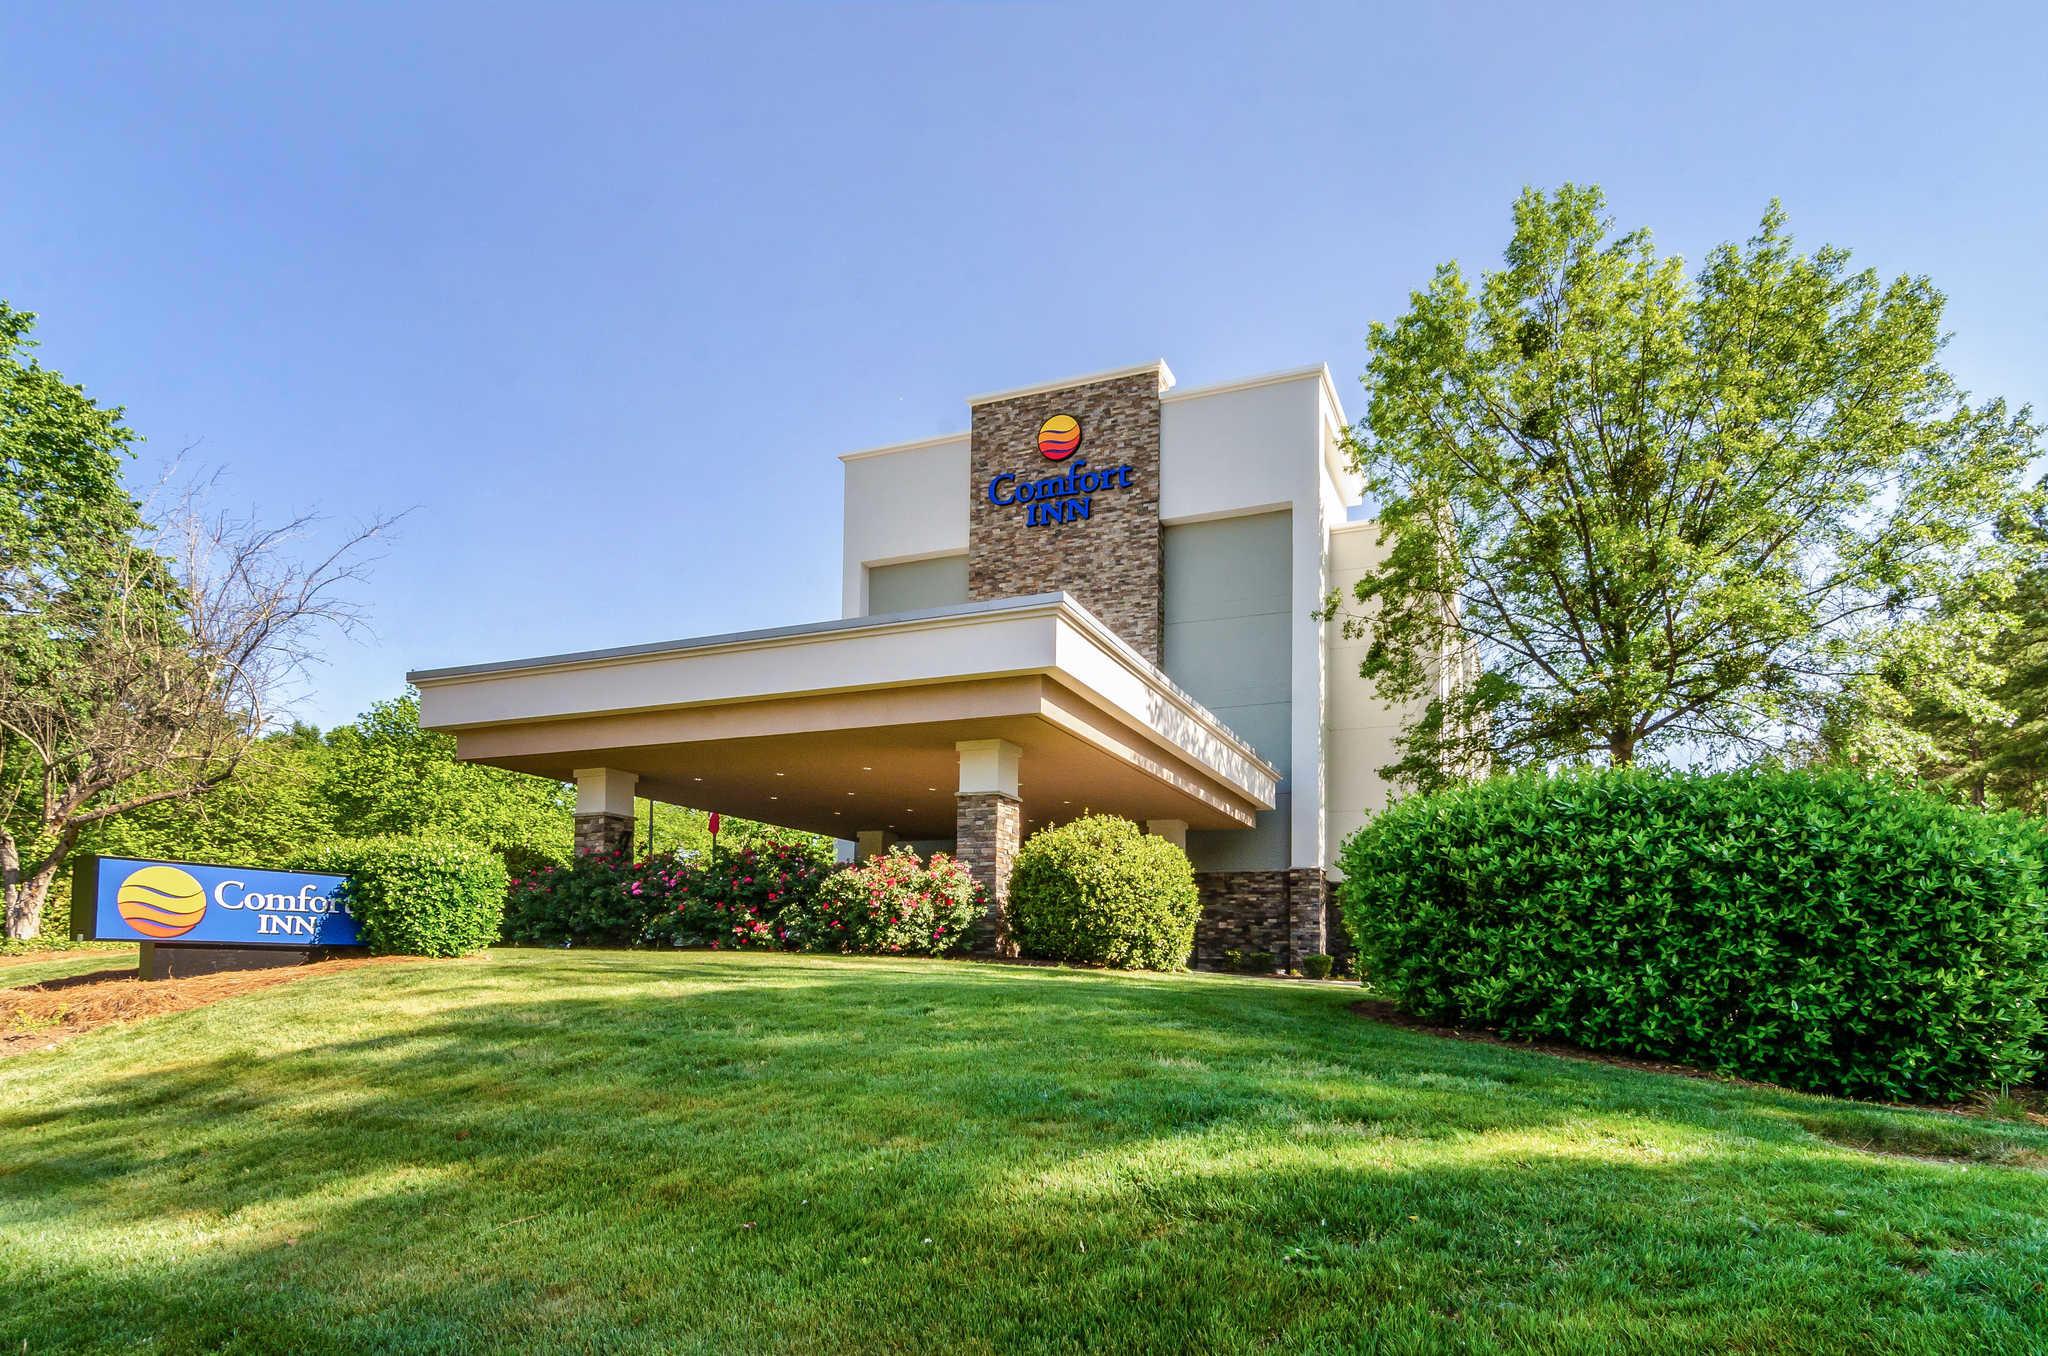 Comfort Inn Raleigh Midtown image 0